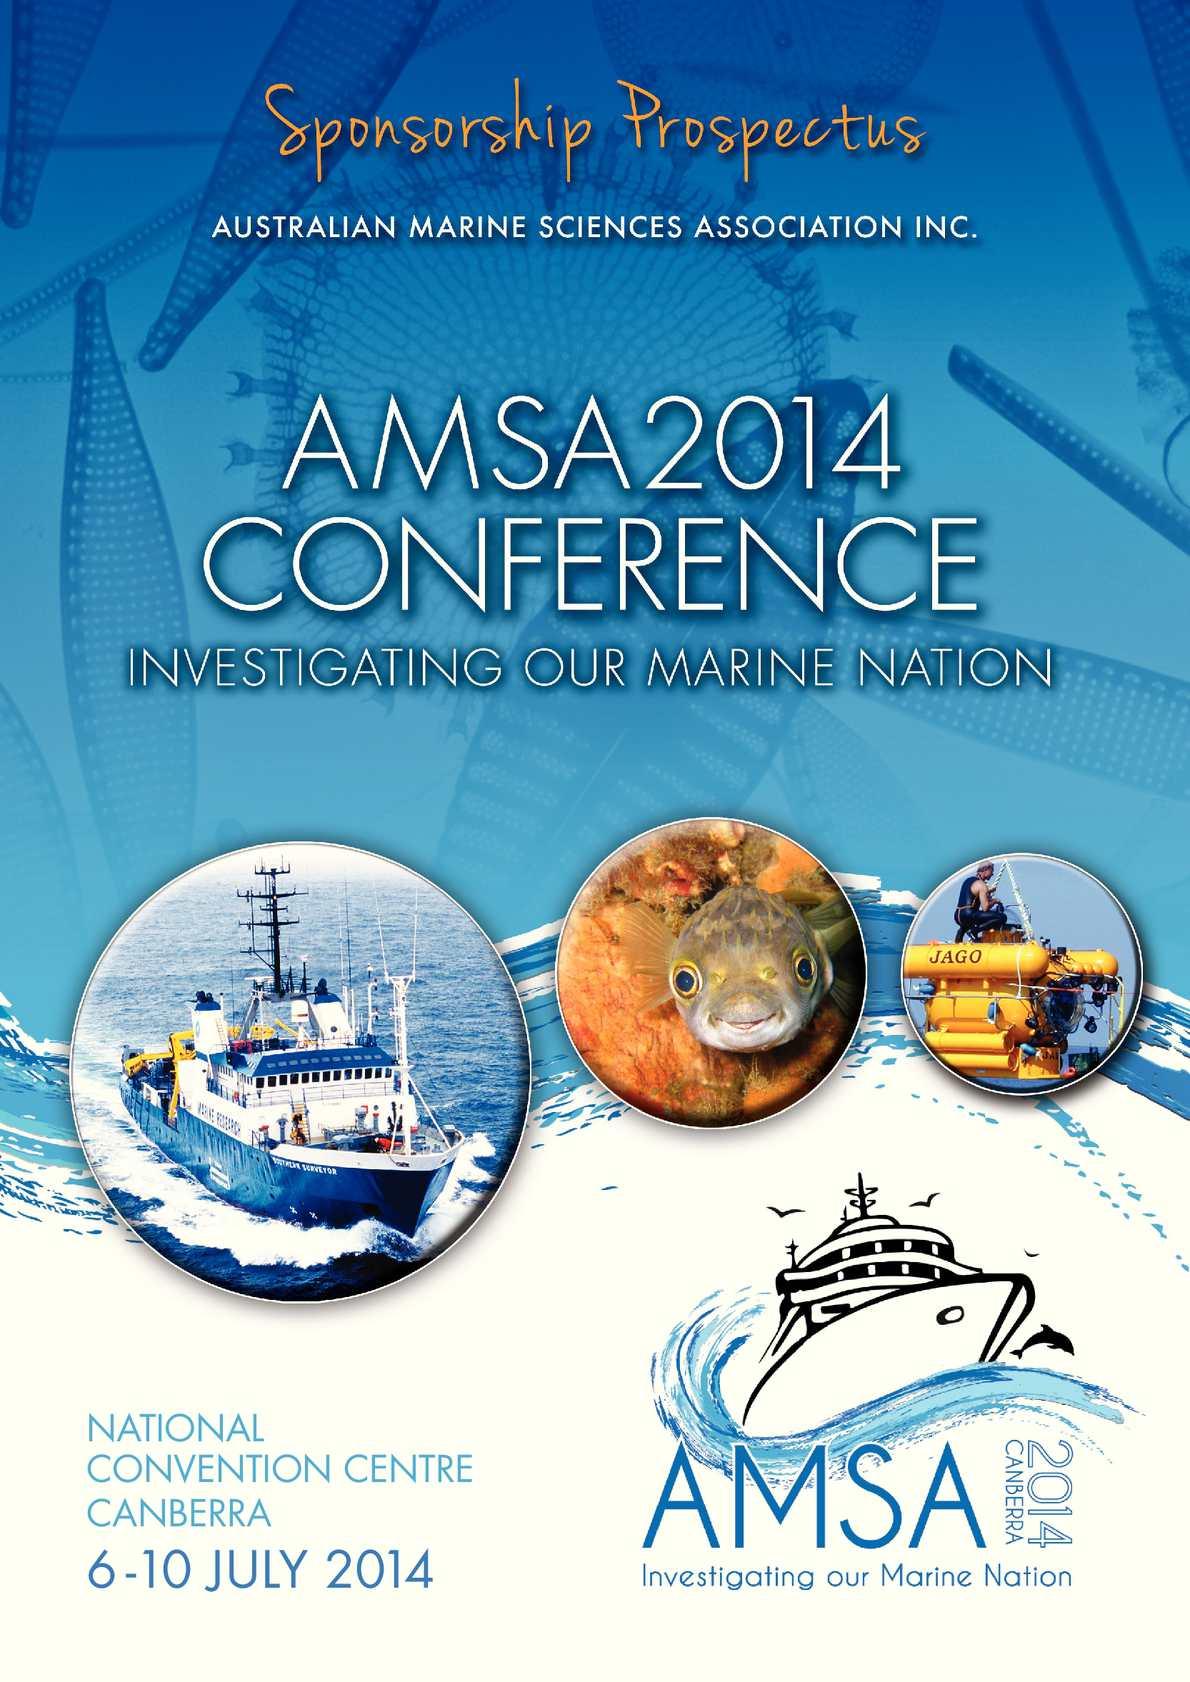 Calaméo - AMSA2014 Sponsorship Prospectus